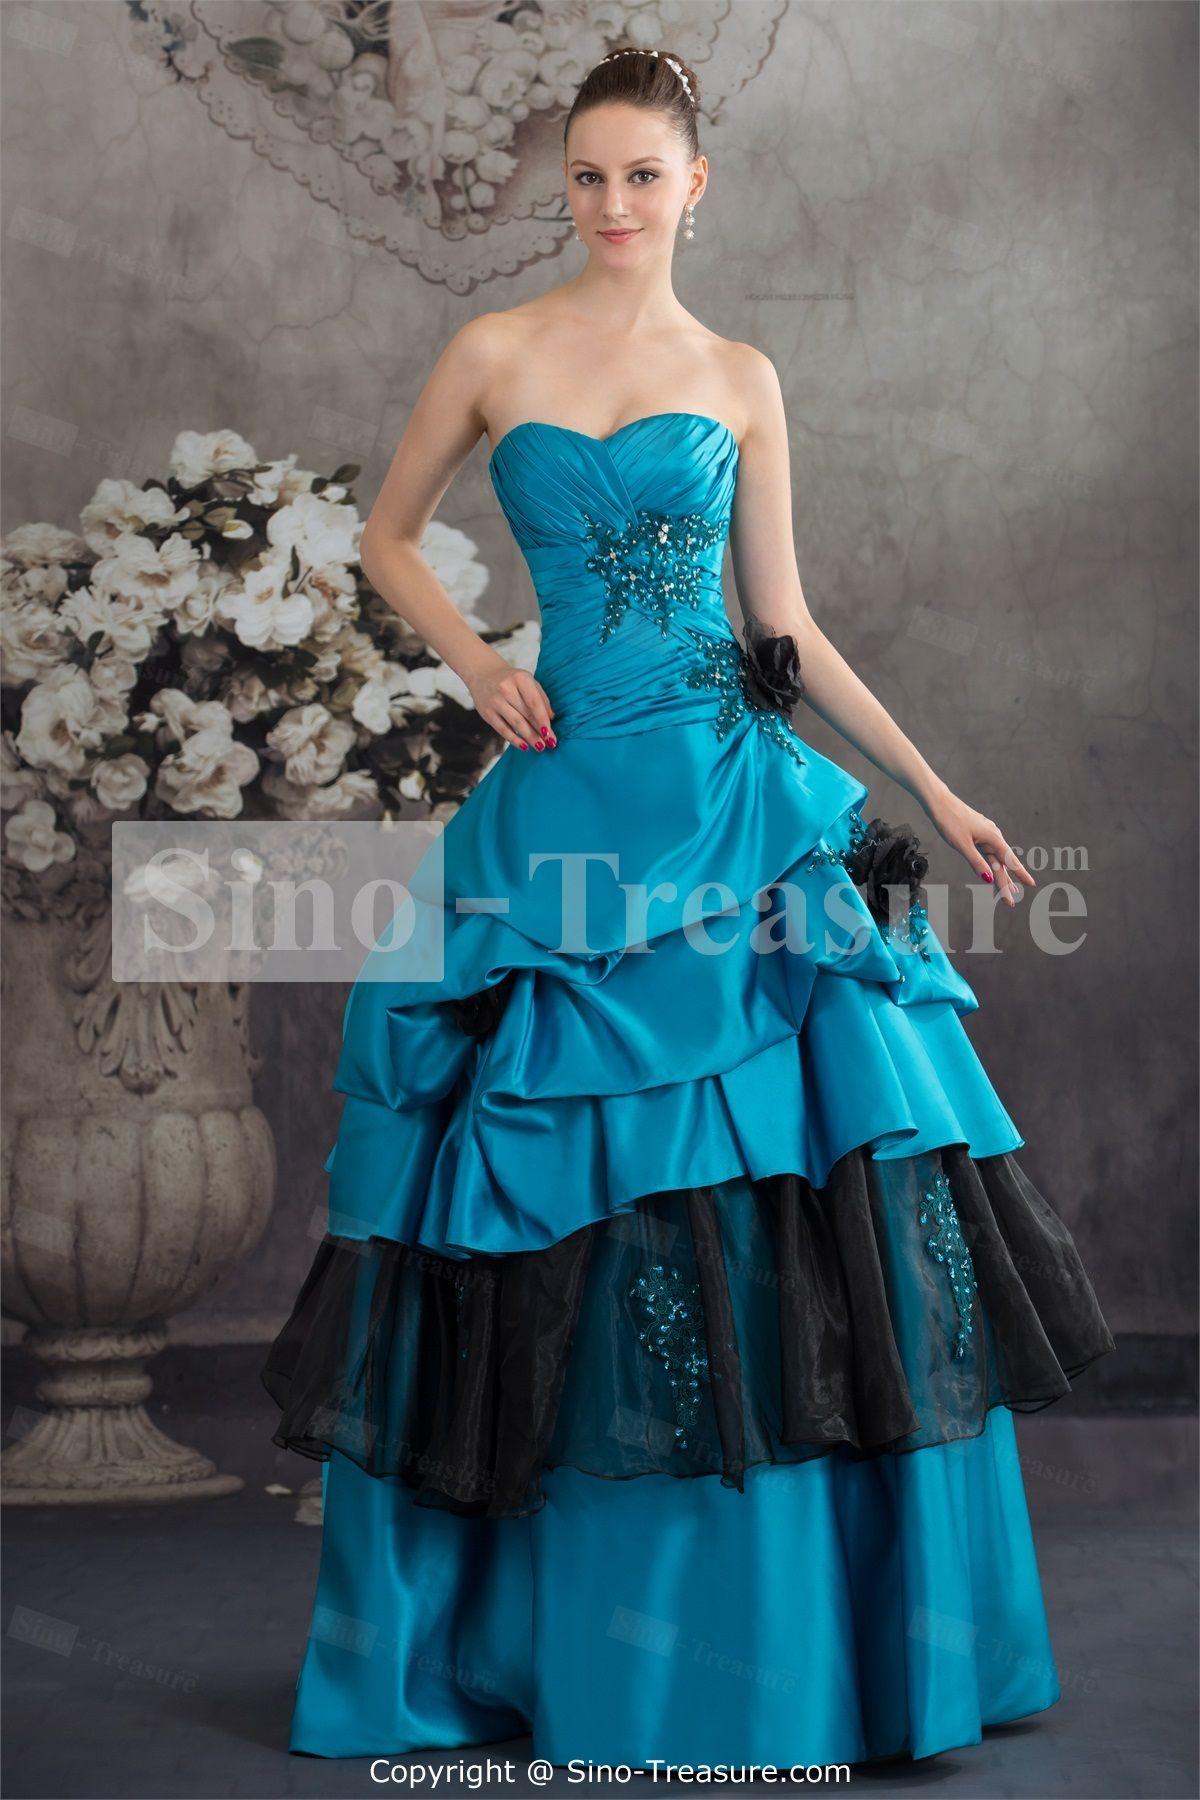 Black and blue wedding dresses wedding dresses pinterest blue